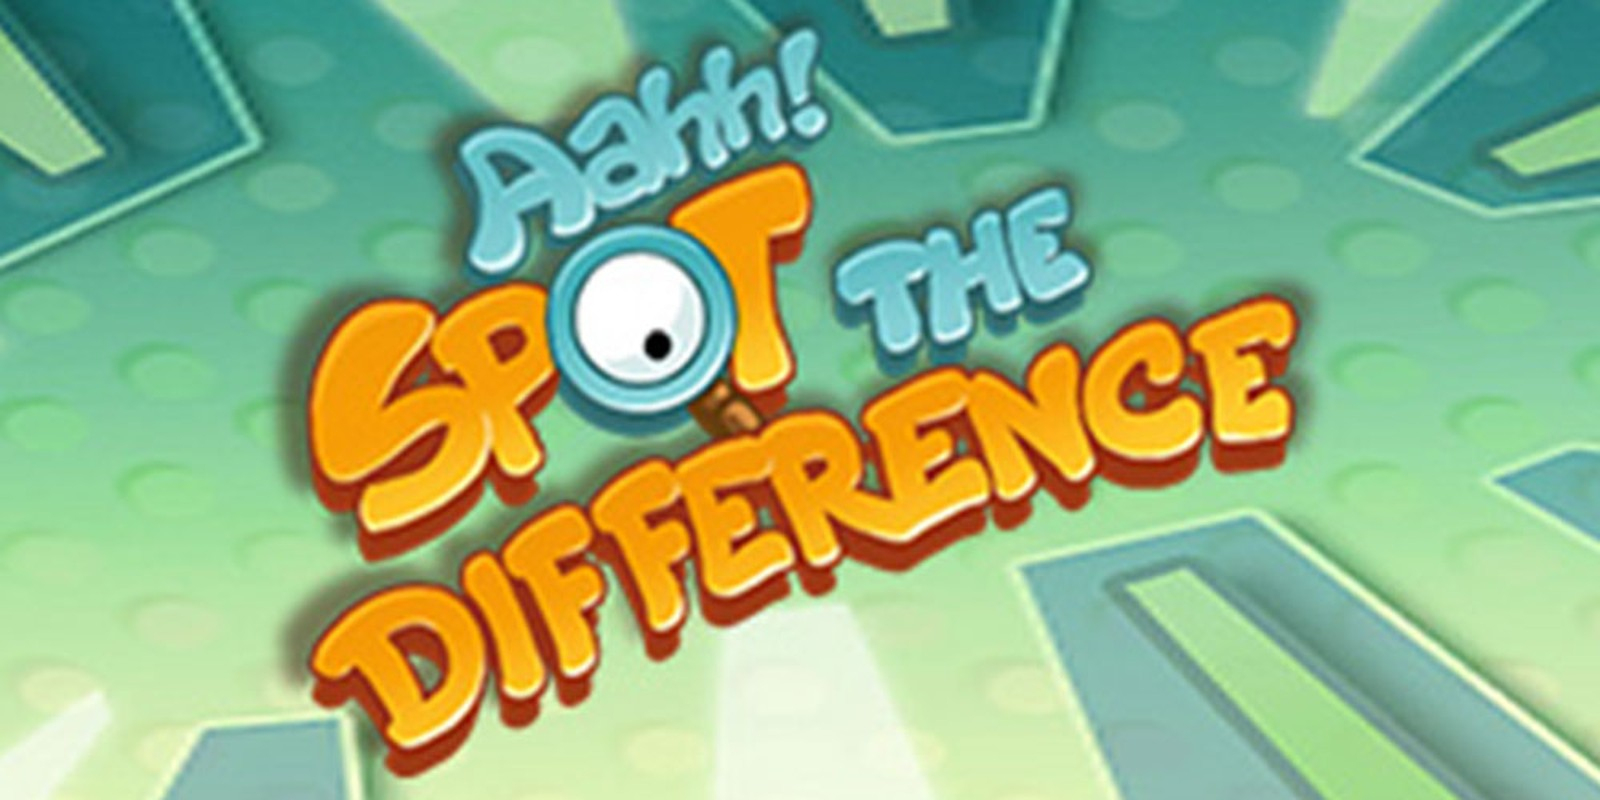 Aahh! Spot The Difference | Nintendo Dsiware | Jeux | Nintendo concernant Jeux De Différence